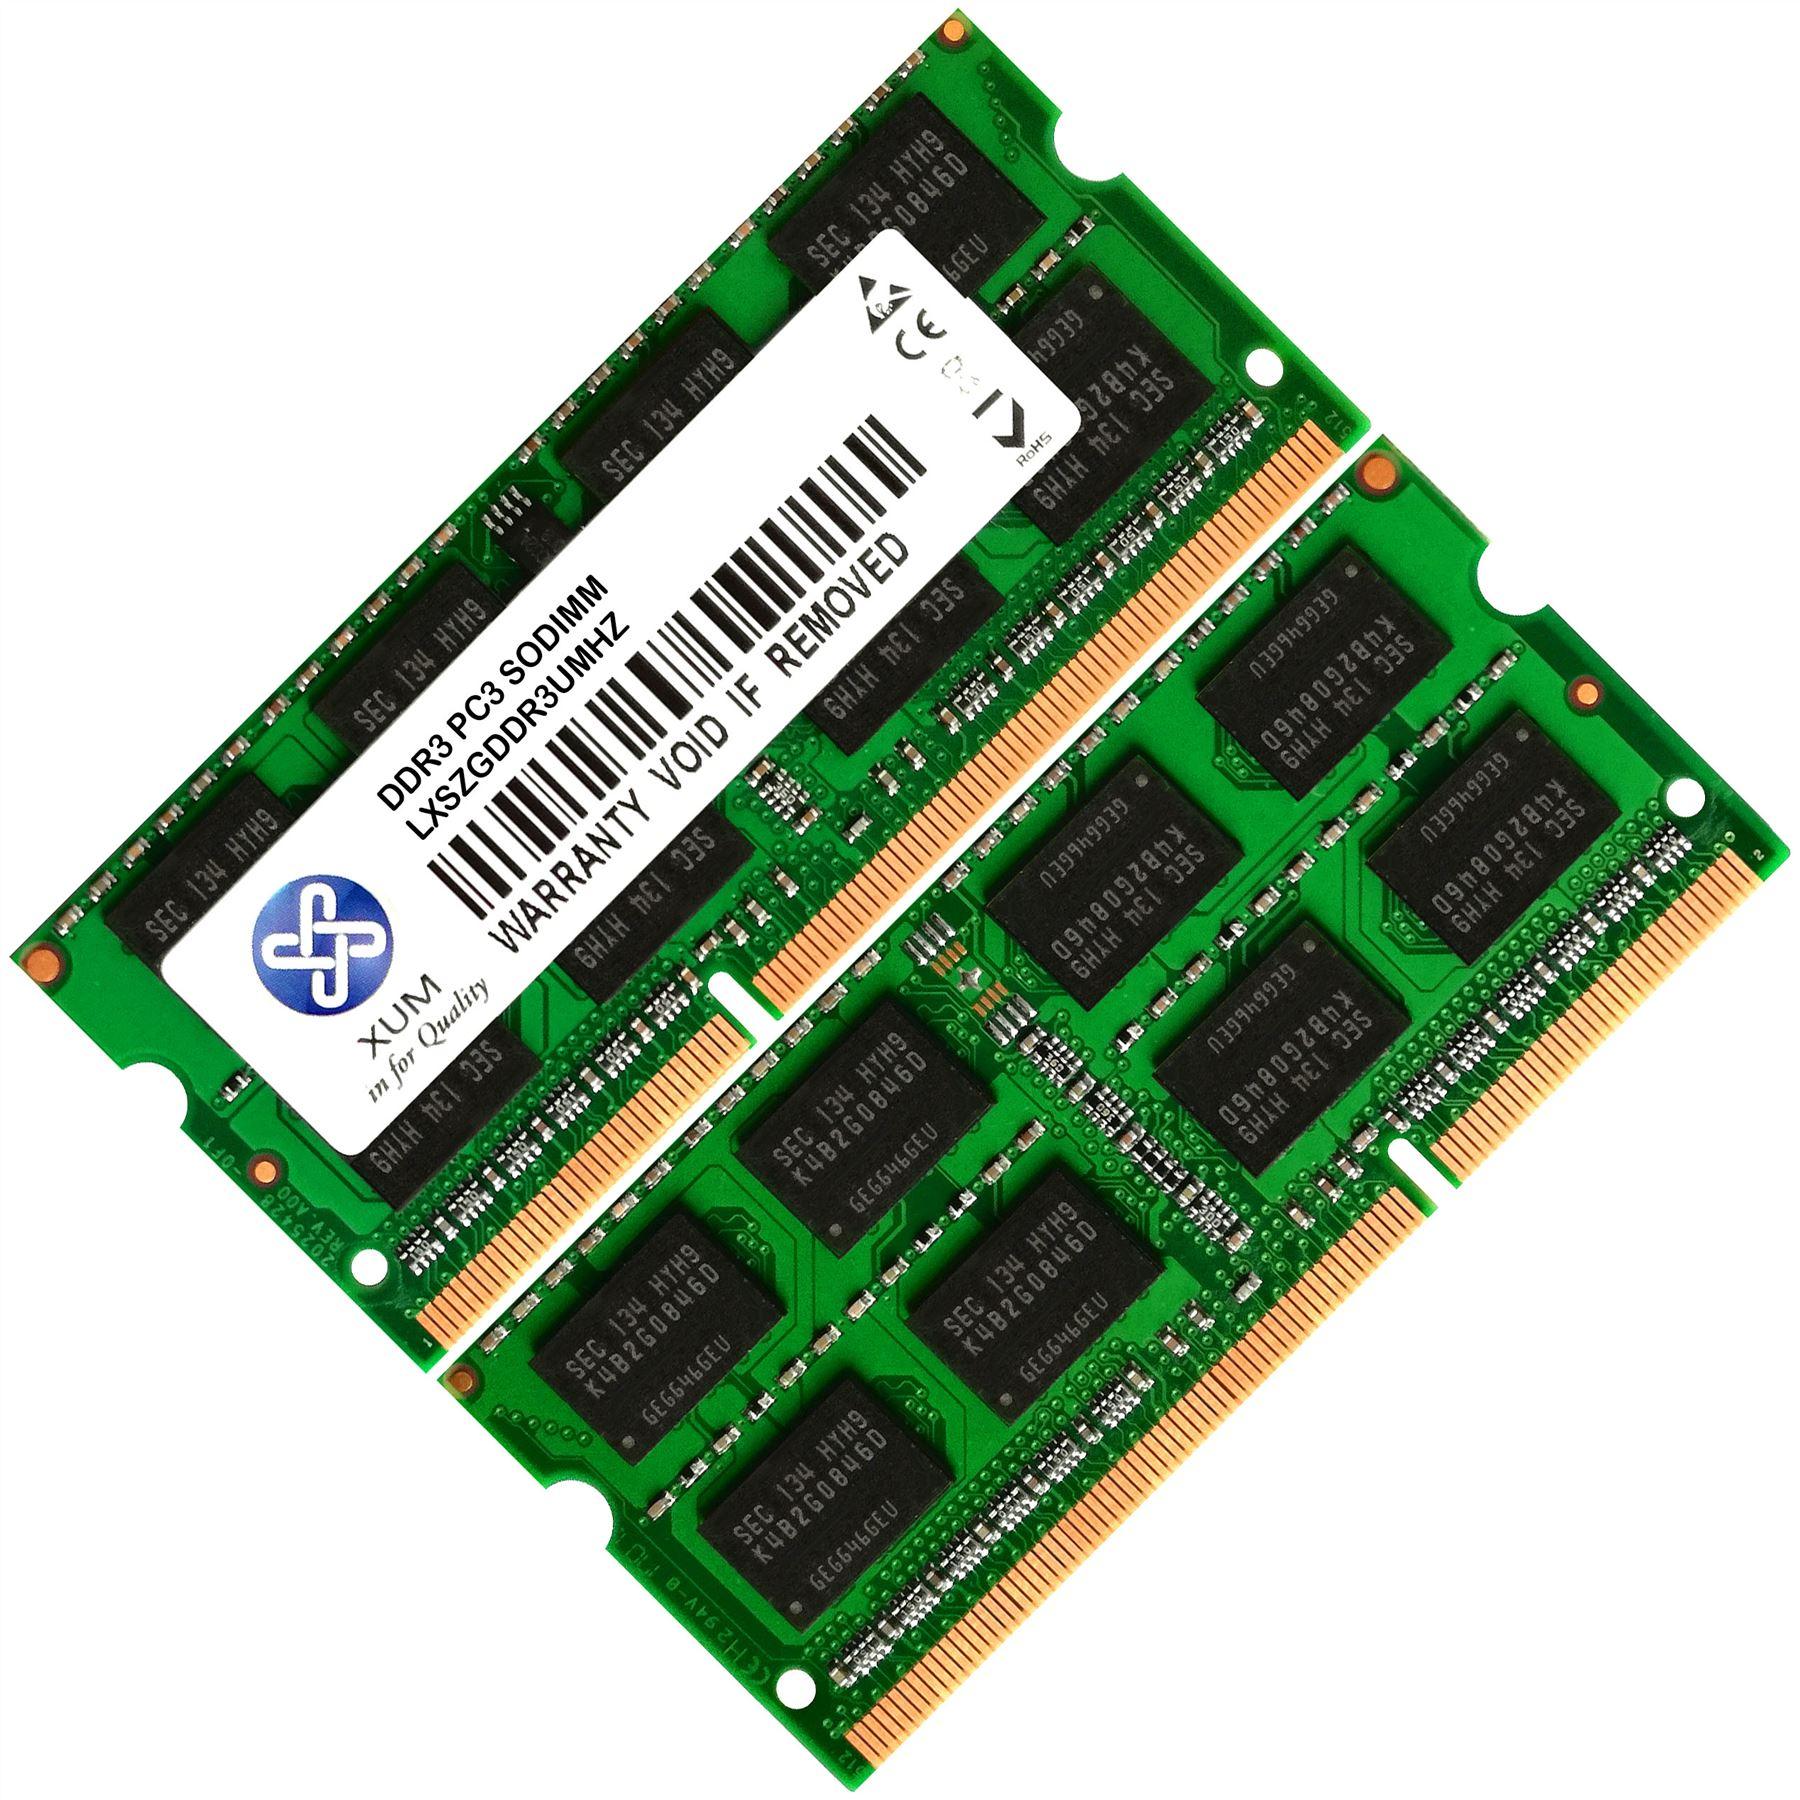 Memoria-Ram-Toshiba-Satellite-Laptop-C850D-118-C850D-11K-Nuevo-Lot-DDR3-SDRAM